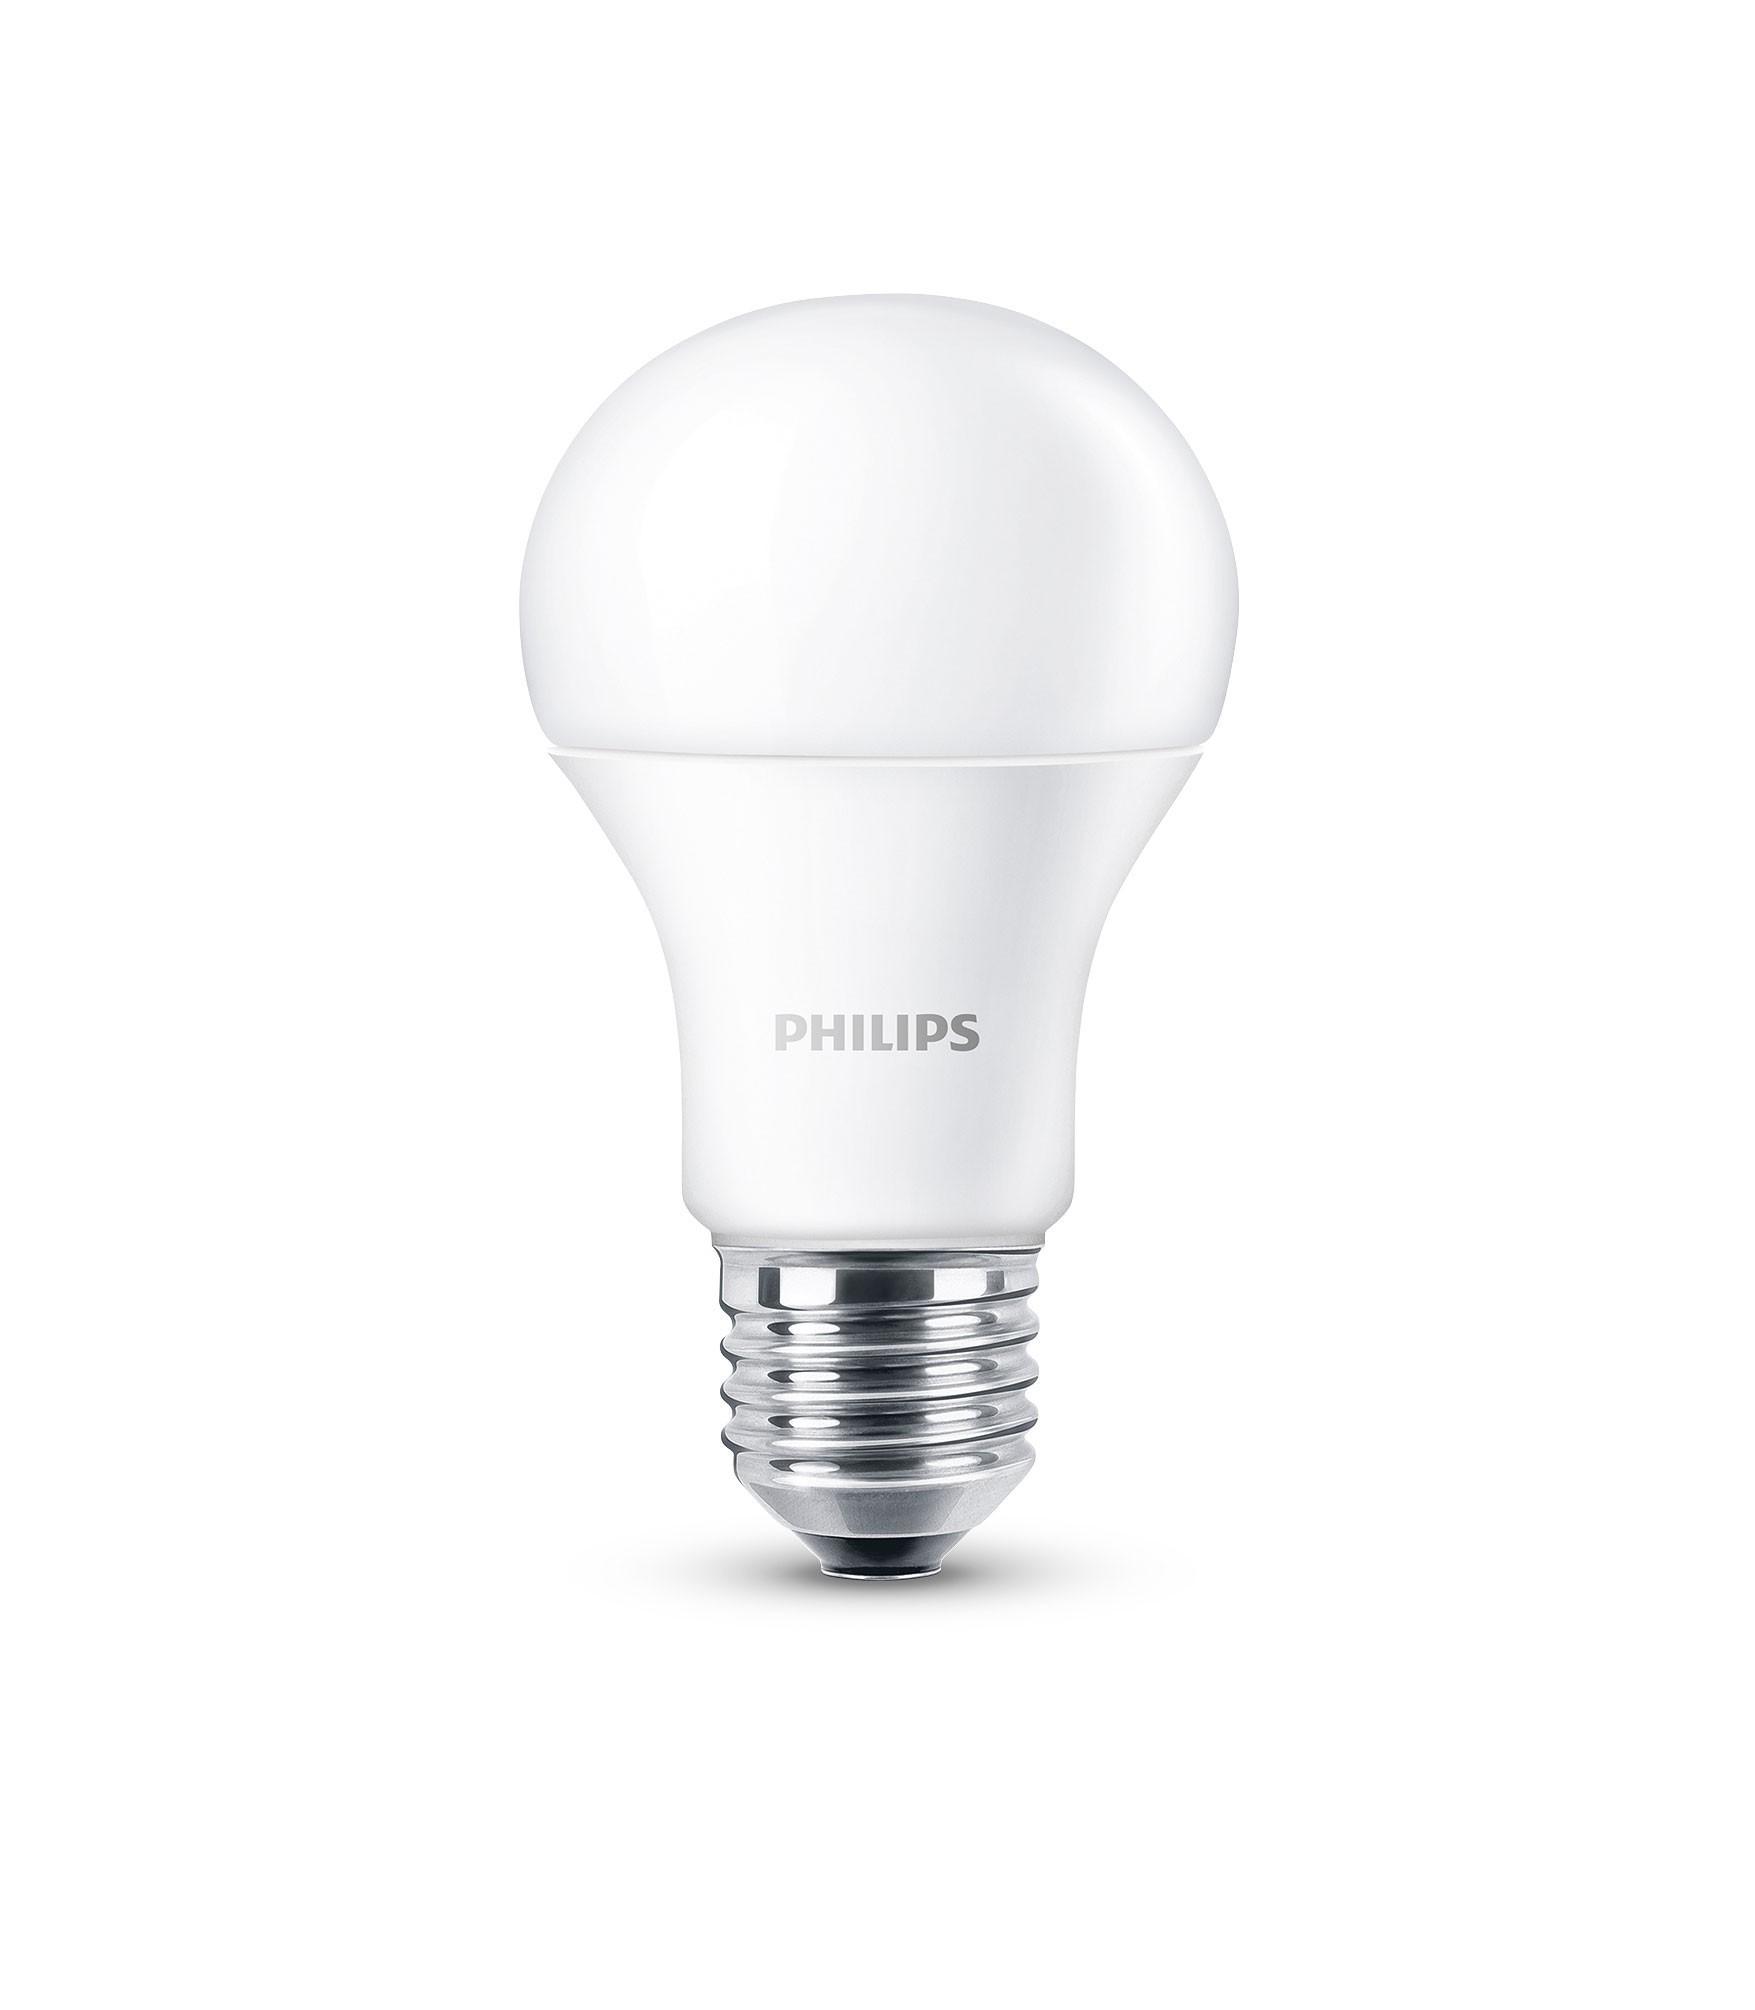 Philips LED Normallampe E27 9 Watt matt Bild 1